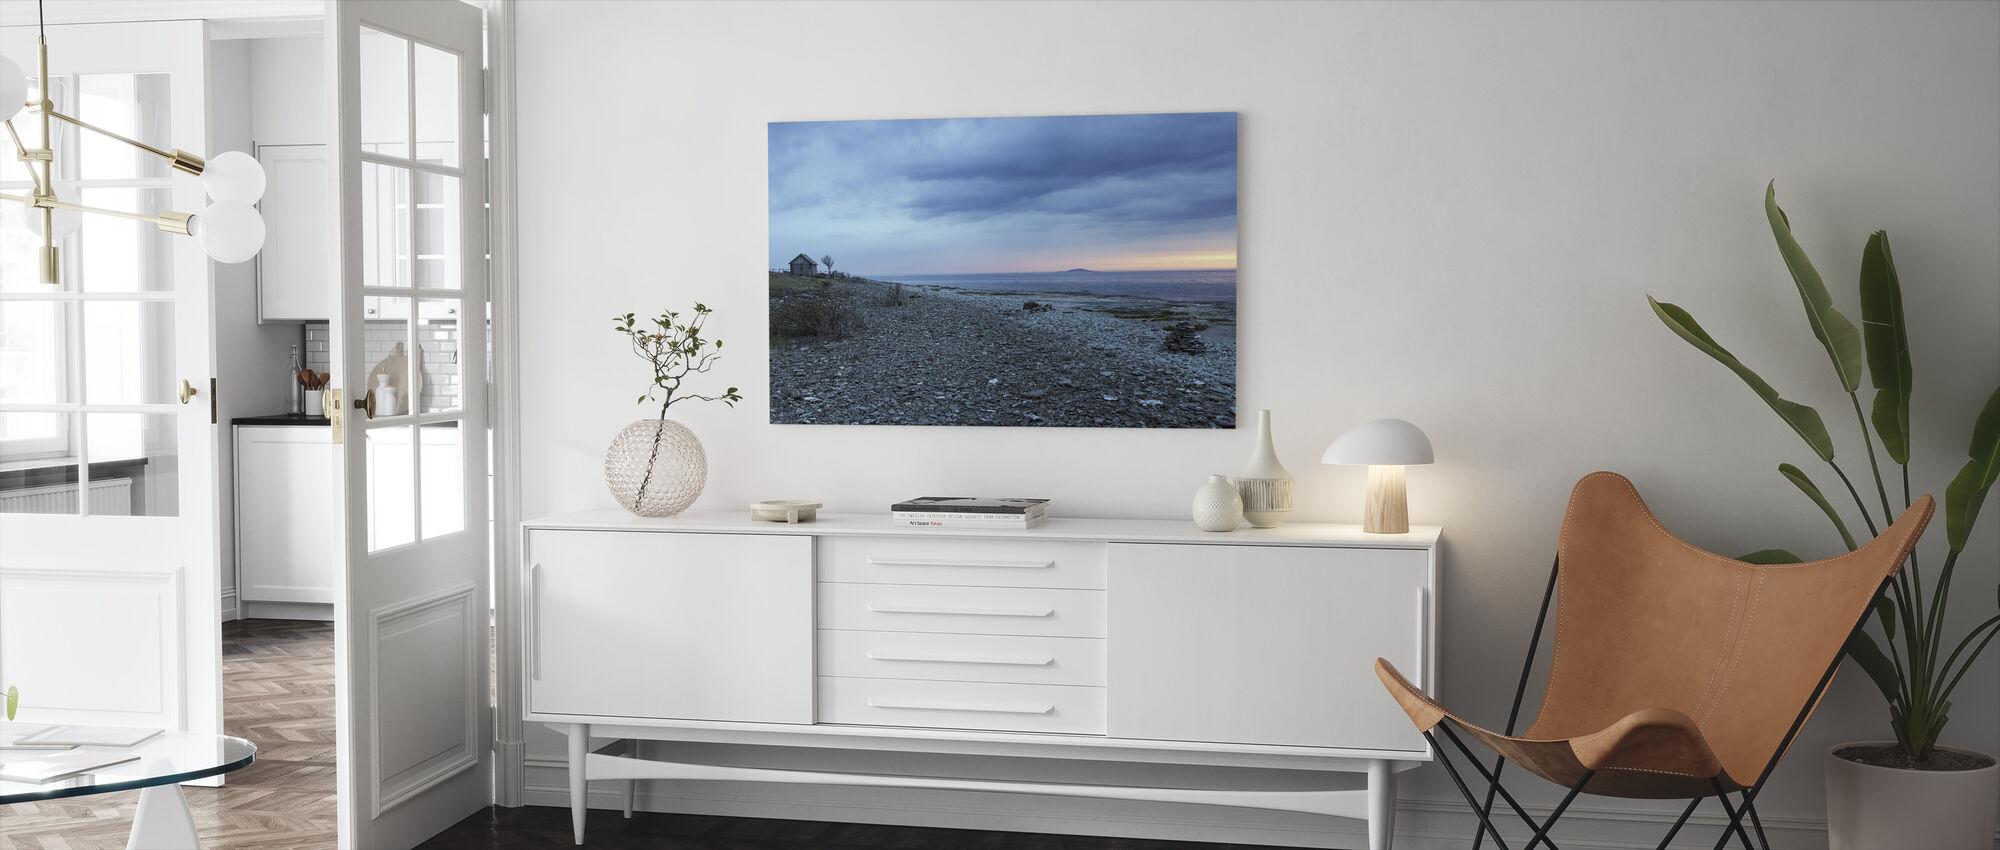 Beach Coastline - Canvas print - Living Room